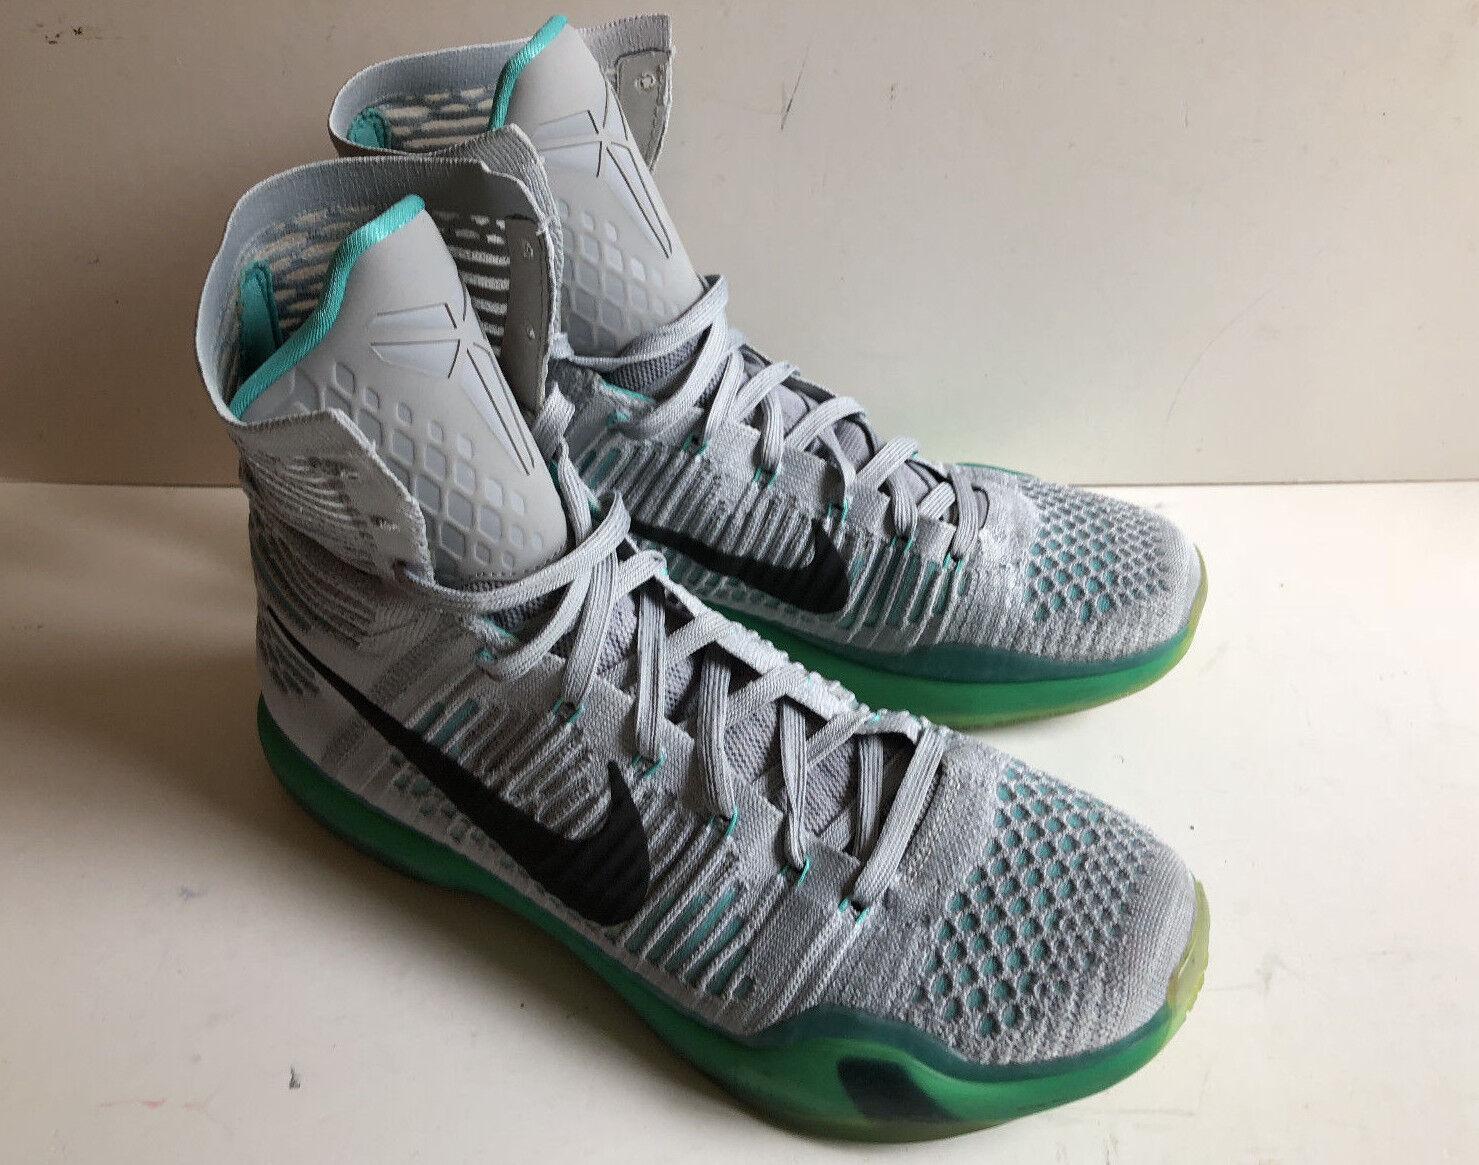 Nike Kobe 10 X Elite Elevate Wolf Grey Size 10.5 Basketball Shoes 718763-041